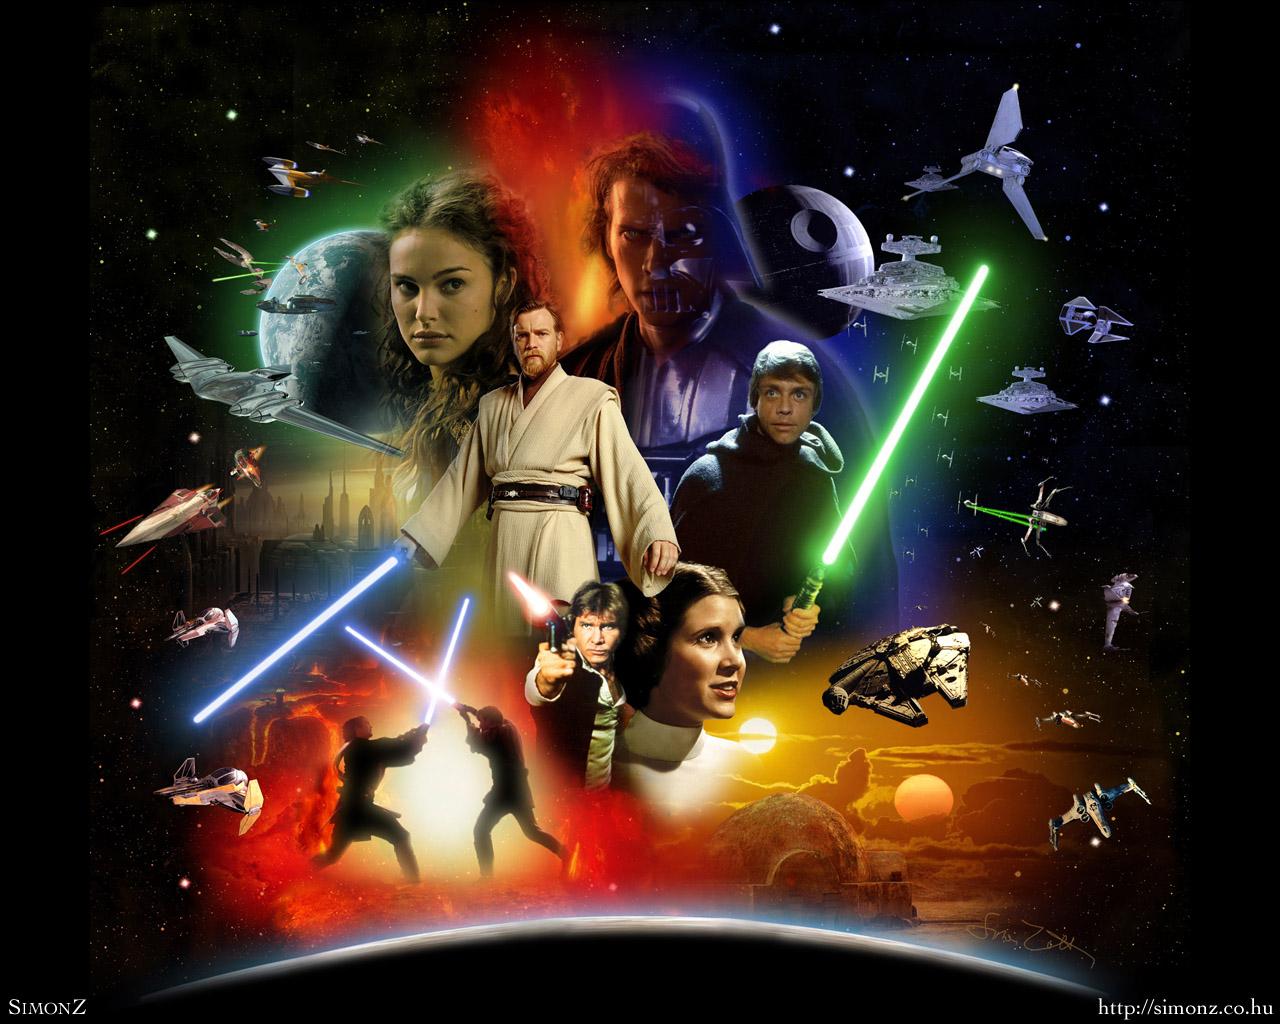 wallpapers free downloads - hhg1216: star wars wallpaper episode 1